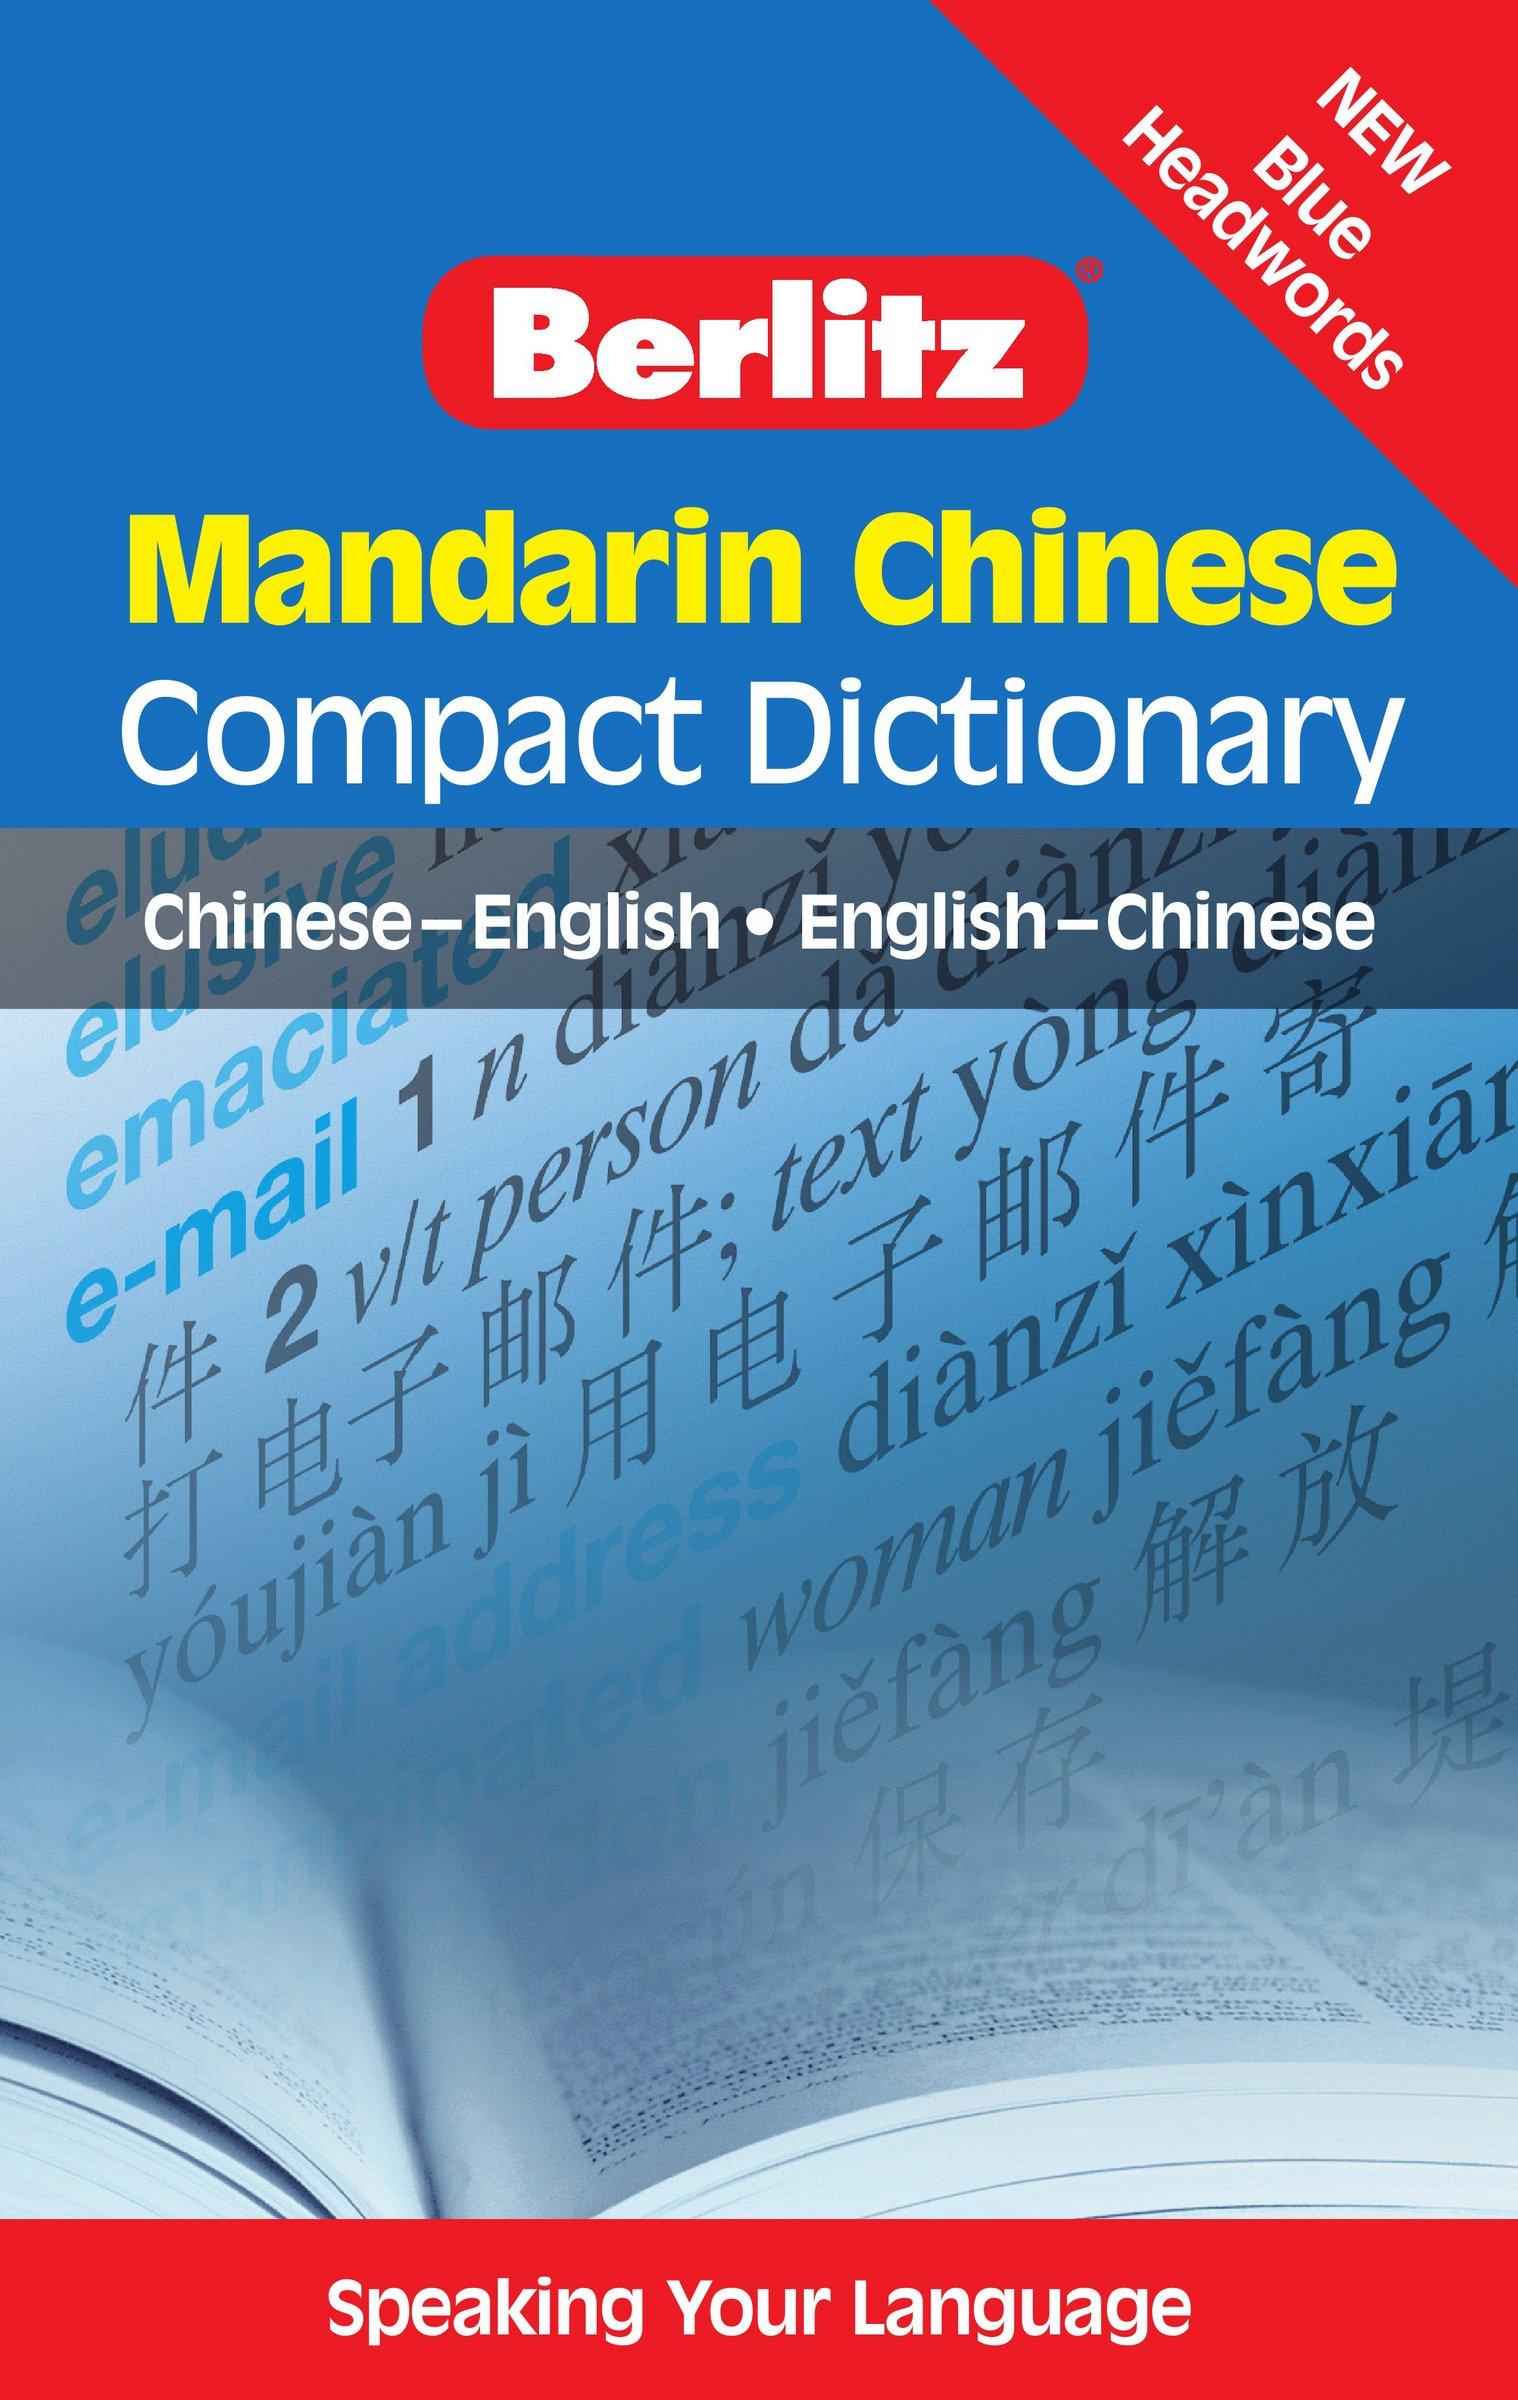 Berlitz Compact Dictionary Mandarin Chinese  Chinesisch Englisch Englisch Chinesisch  Berlitz Compact Dictionaries